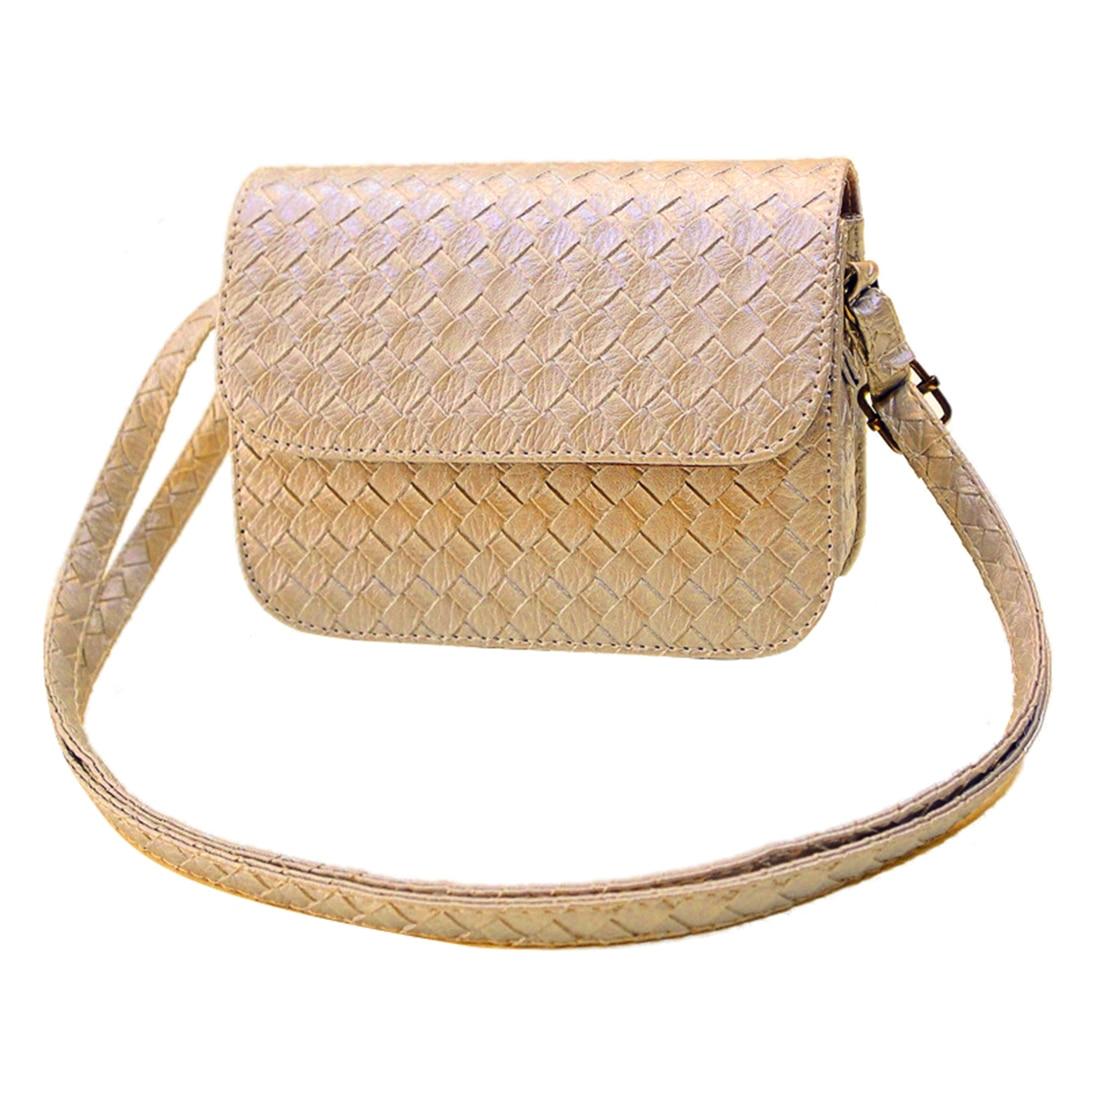 FGGS New Womens PU Leather Handbag Fashion Shoulder Bag Clutch Tote Purse Messenger(Gold) naivety new fashion women tassel clutch purse bag pu leather handbag evening party satchel s61222 drop shipping